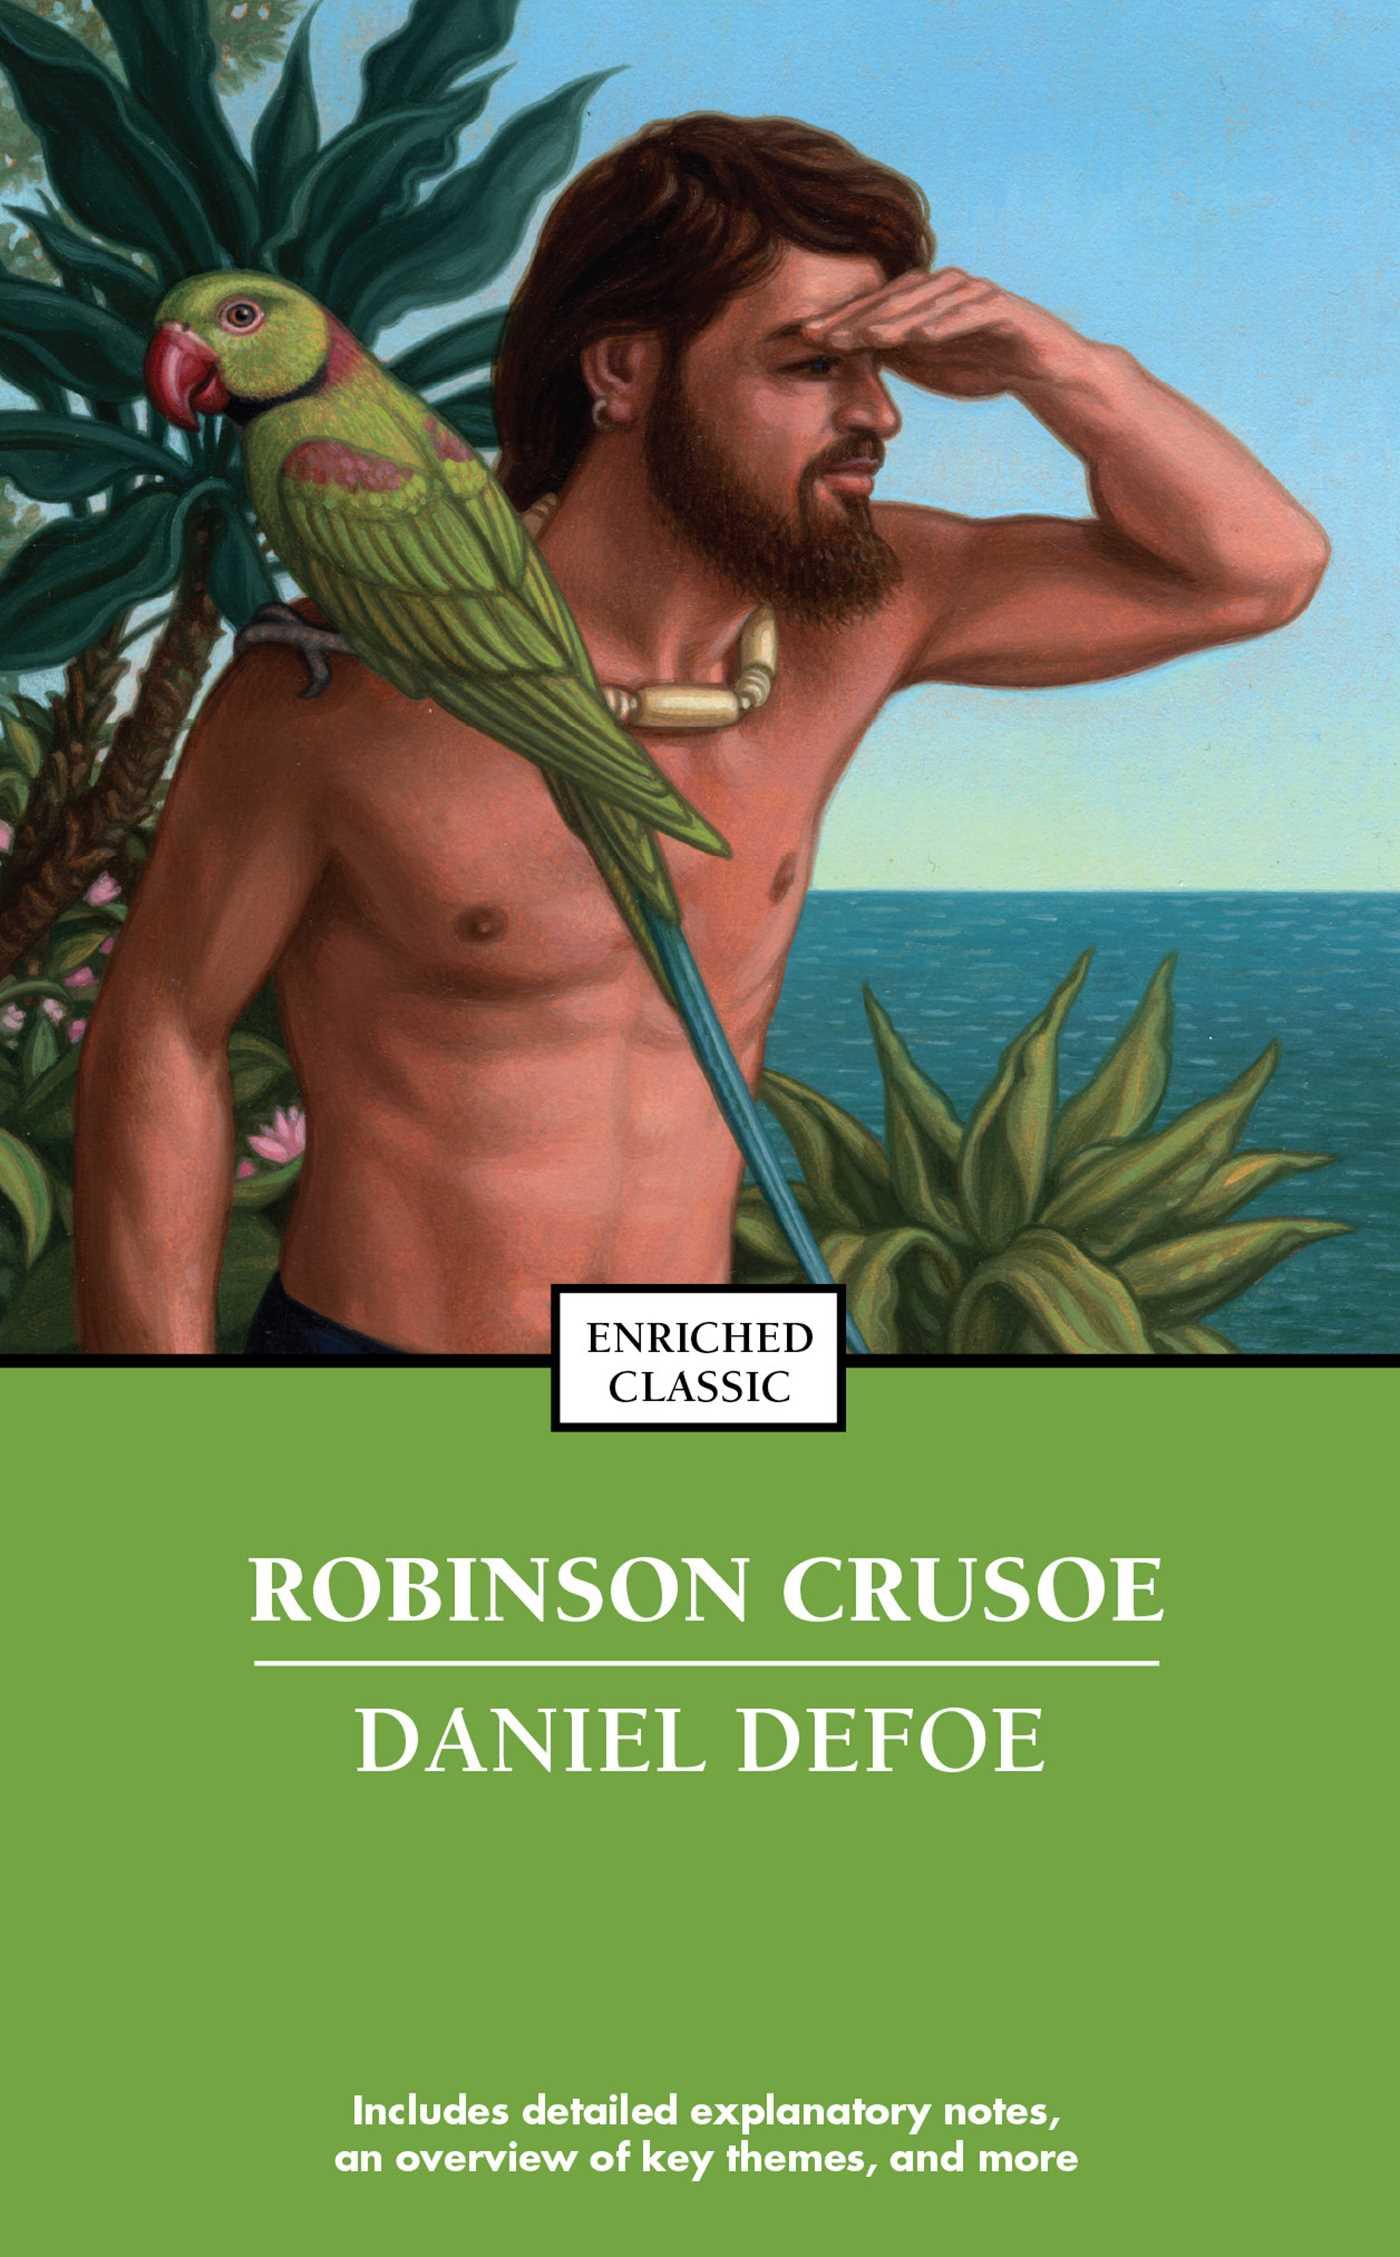 biblical reference in robinson crusoe Biblical reference in robinson crusoe essaythere are many biblical references in robinson crusoe, a novel by daniel defoe about a man, crusoe.